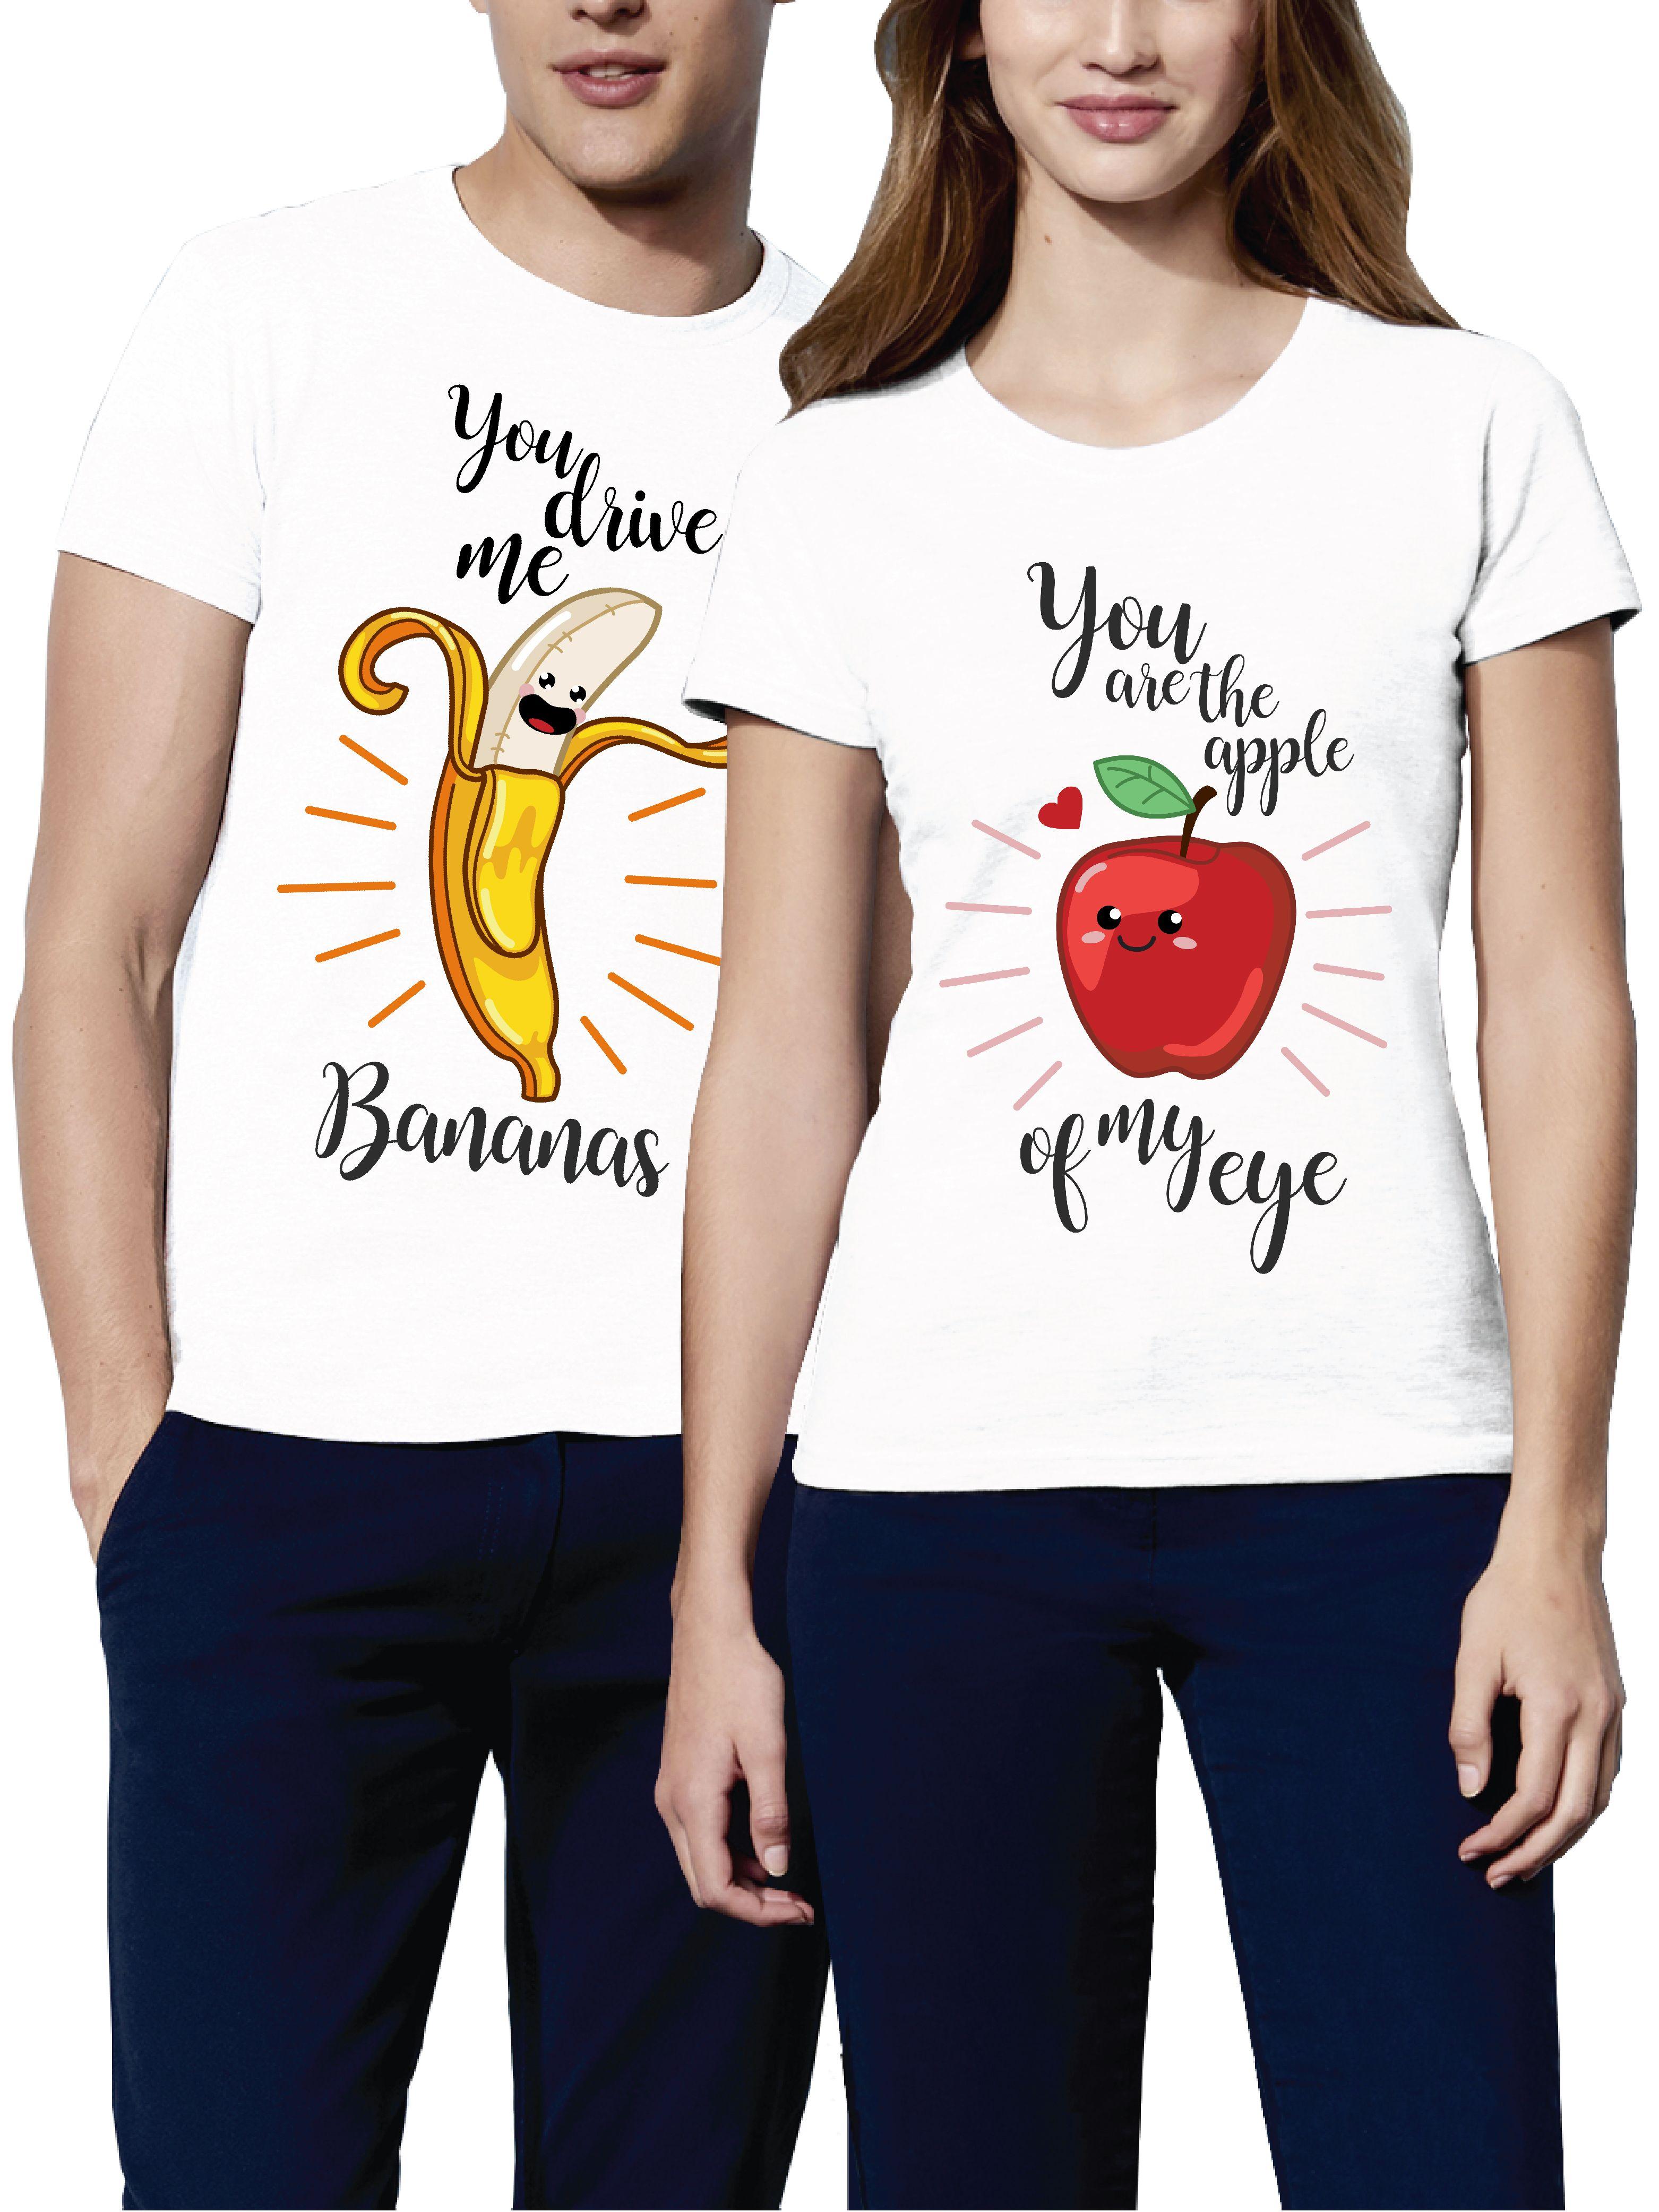 198eab9257 pärchen t-shirts / batman t shirt / batman couple shirts / couple shirts /  his and hers shirts / couple t shirts / couples matching shirts